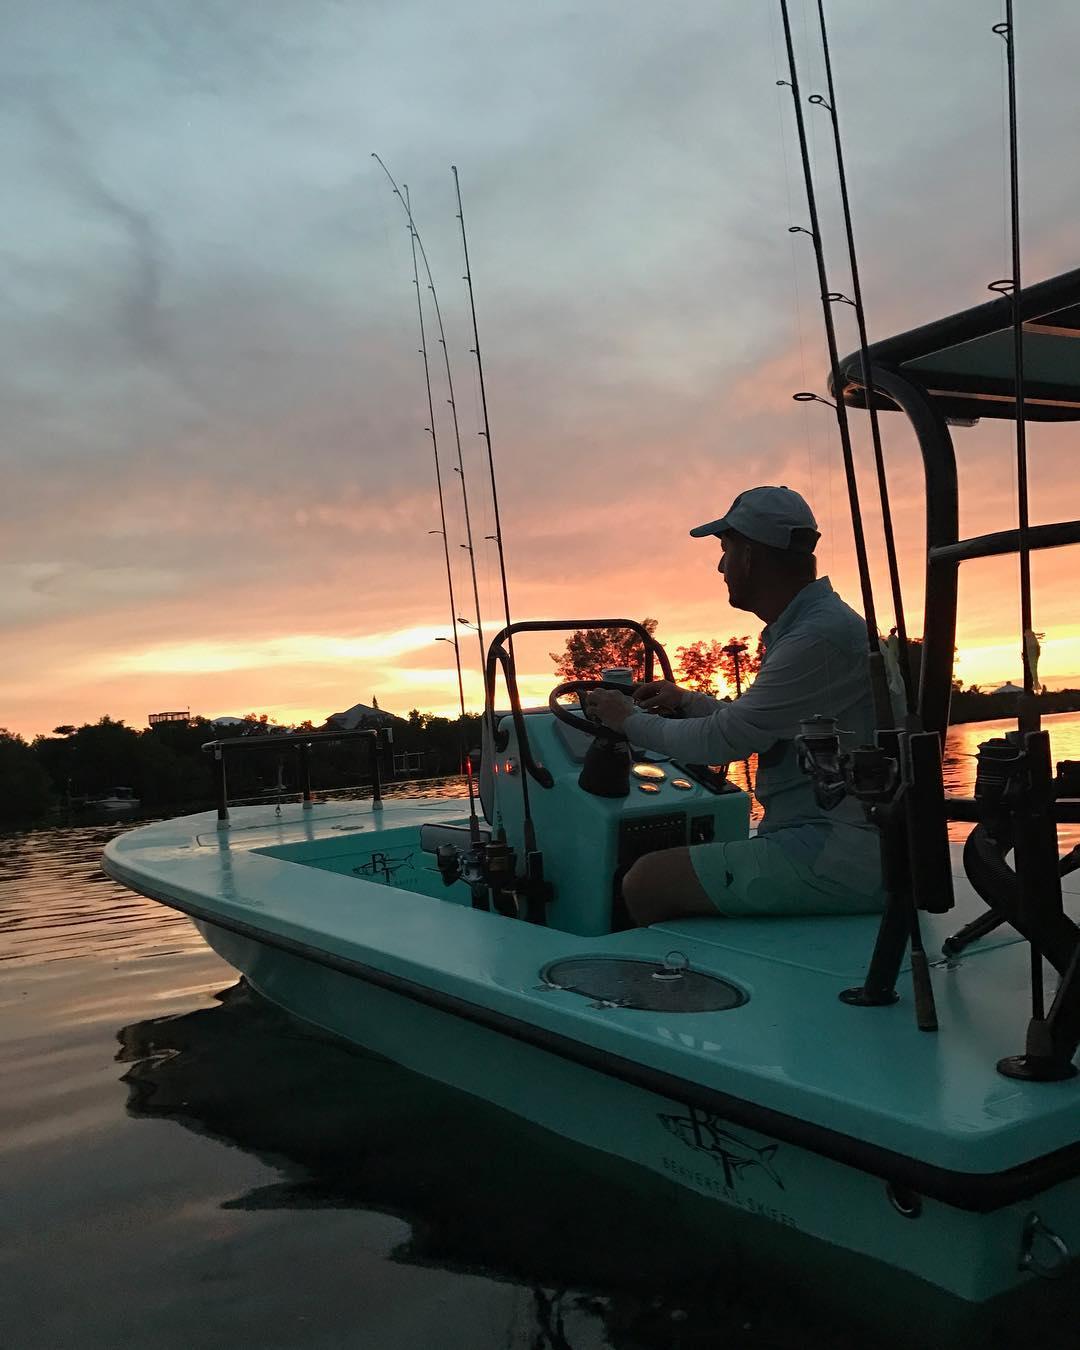 Beavertail Skiff in the sunset